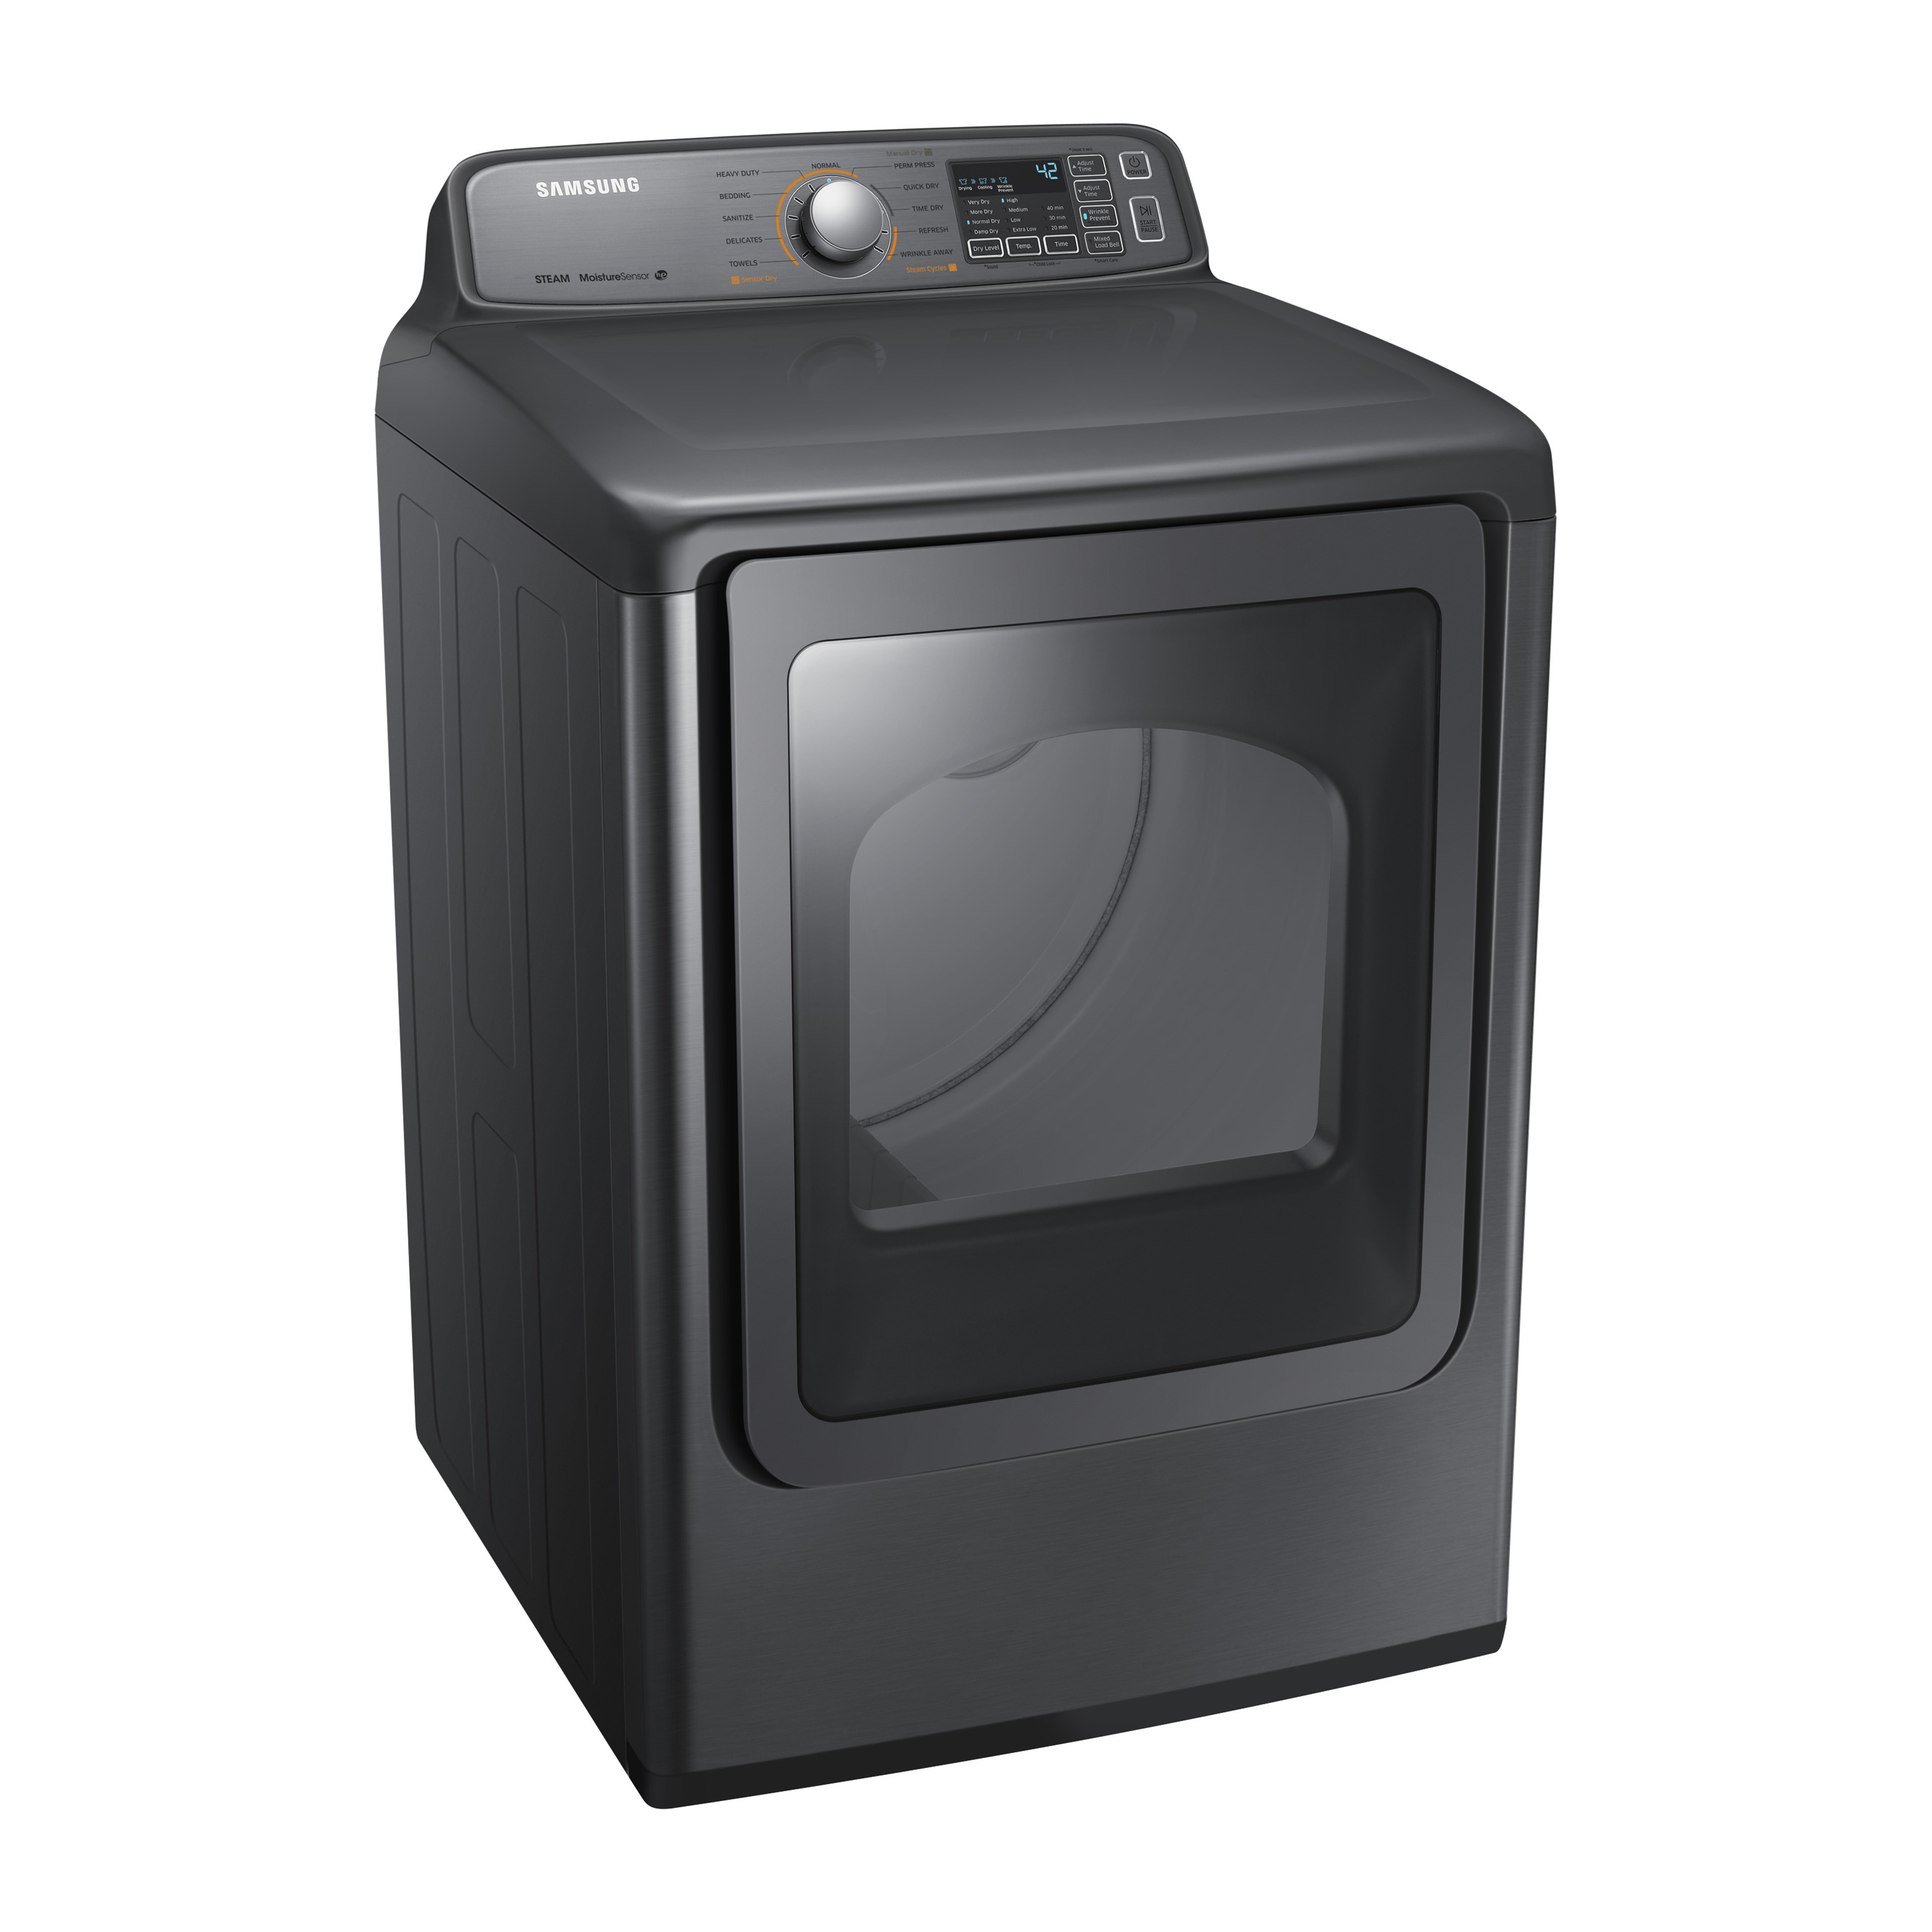 Samsung 7.4 cu. ft. Top Load Gas Dryer - Platinum